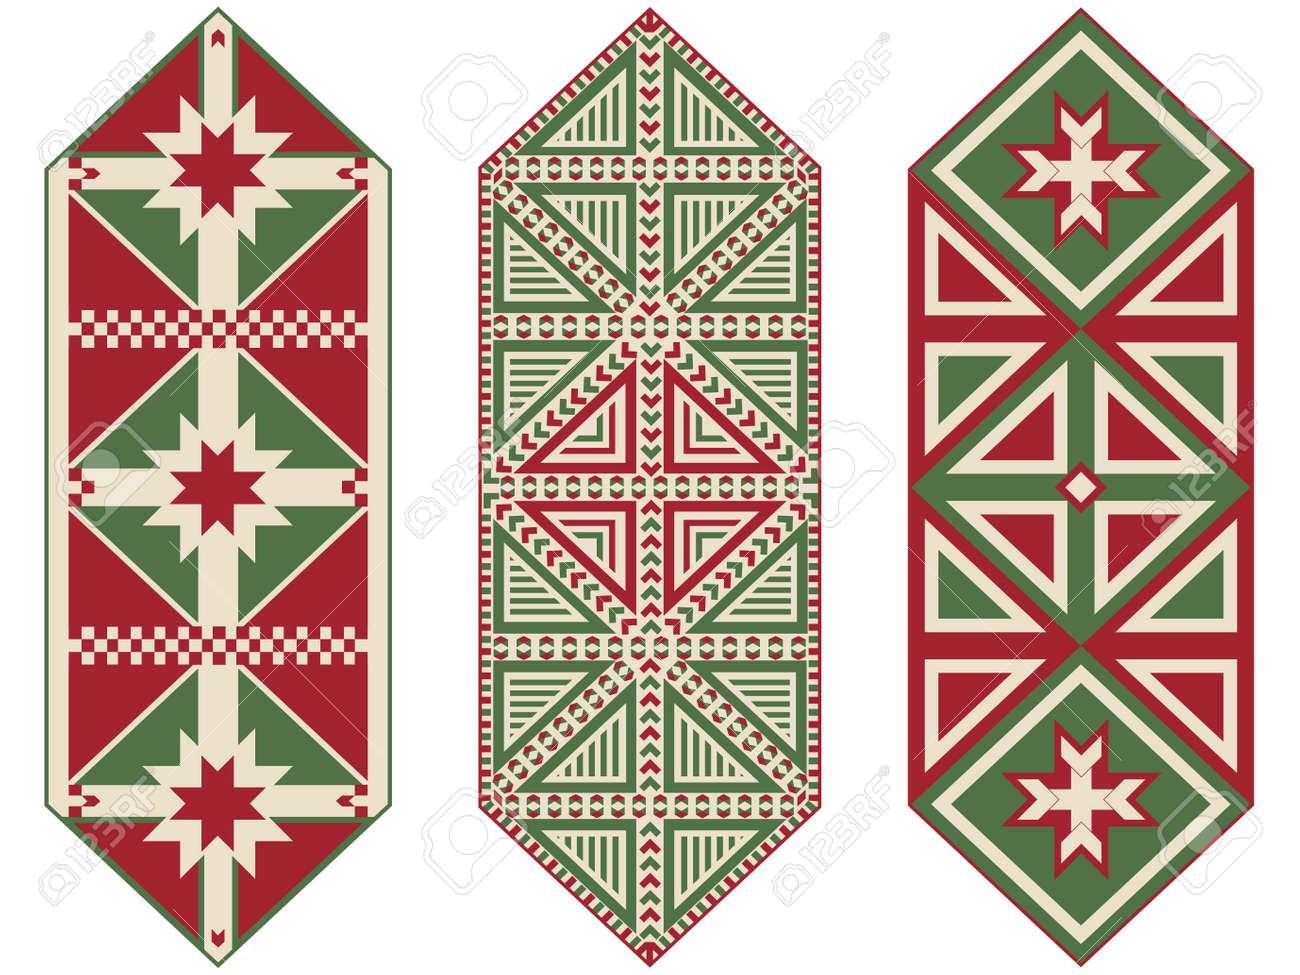 Christmas Table Runners.Set Of Ornamental Christmas Table Runners